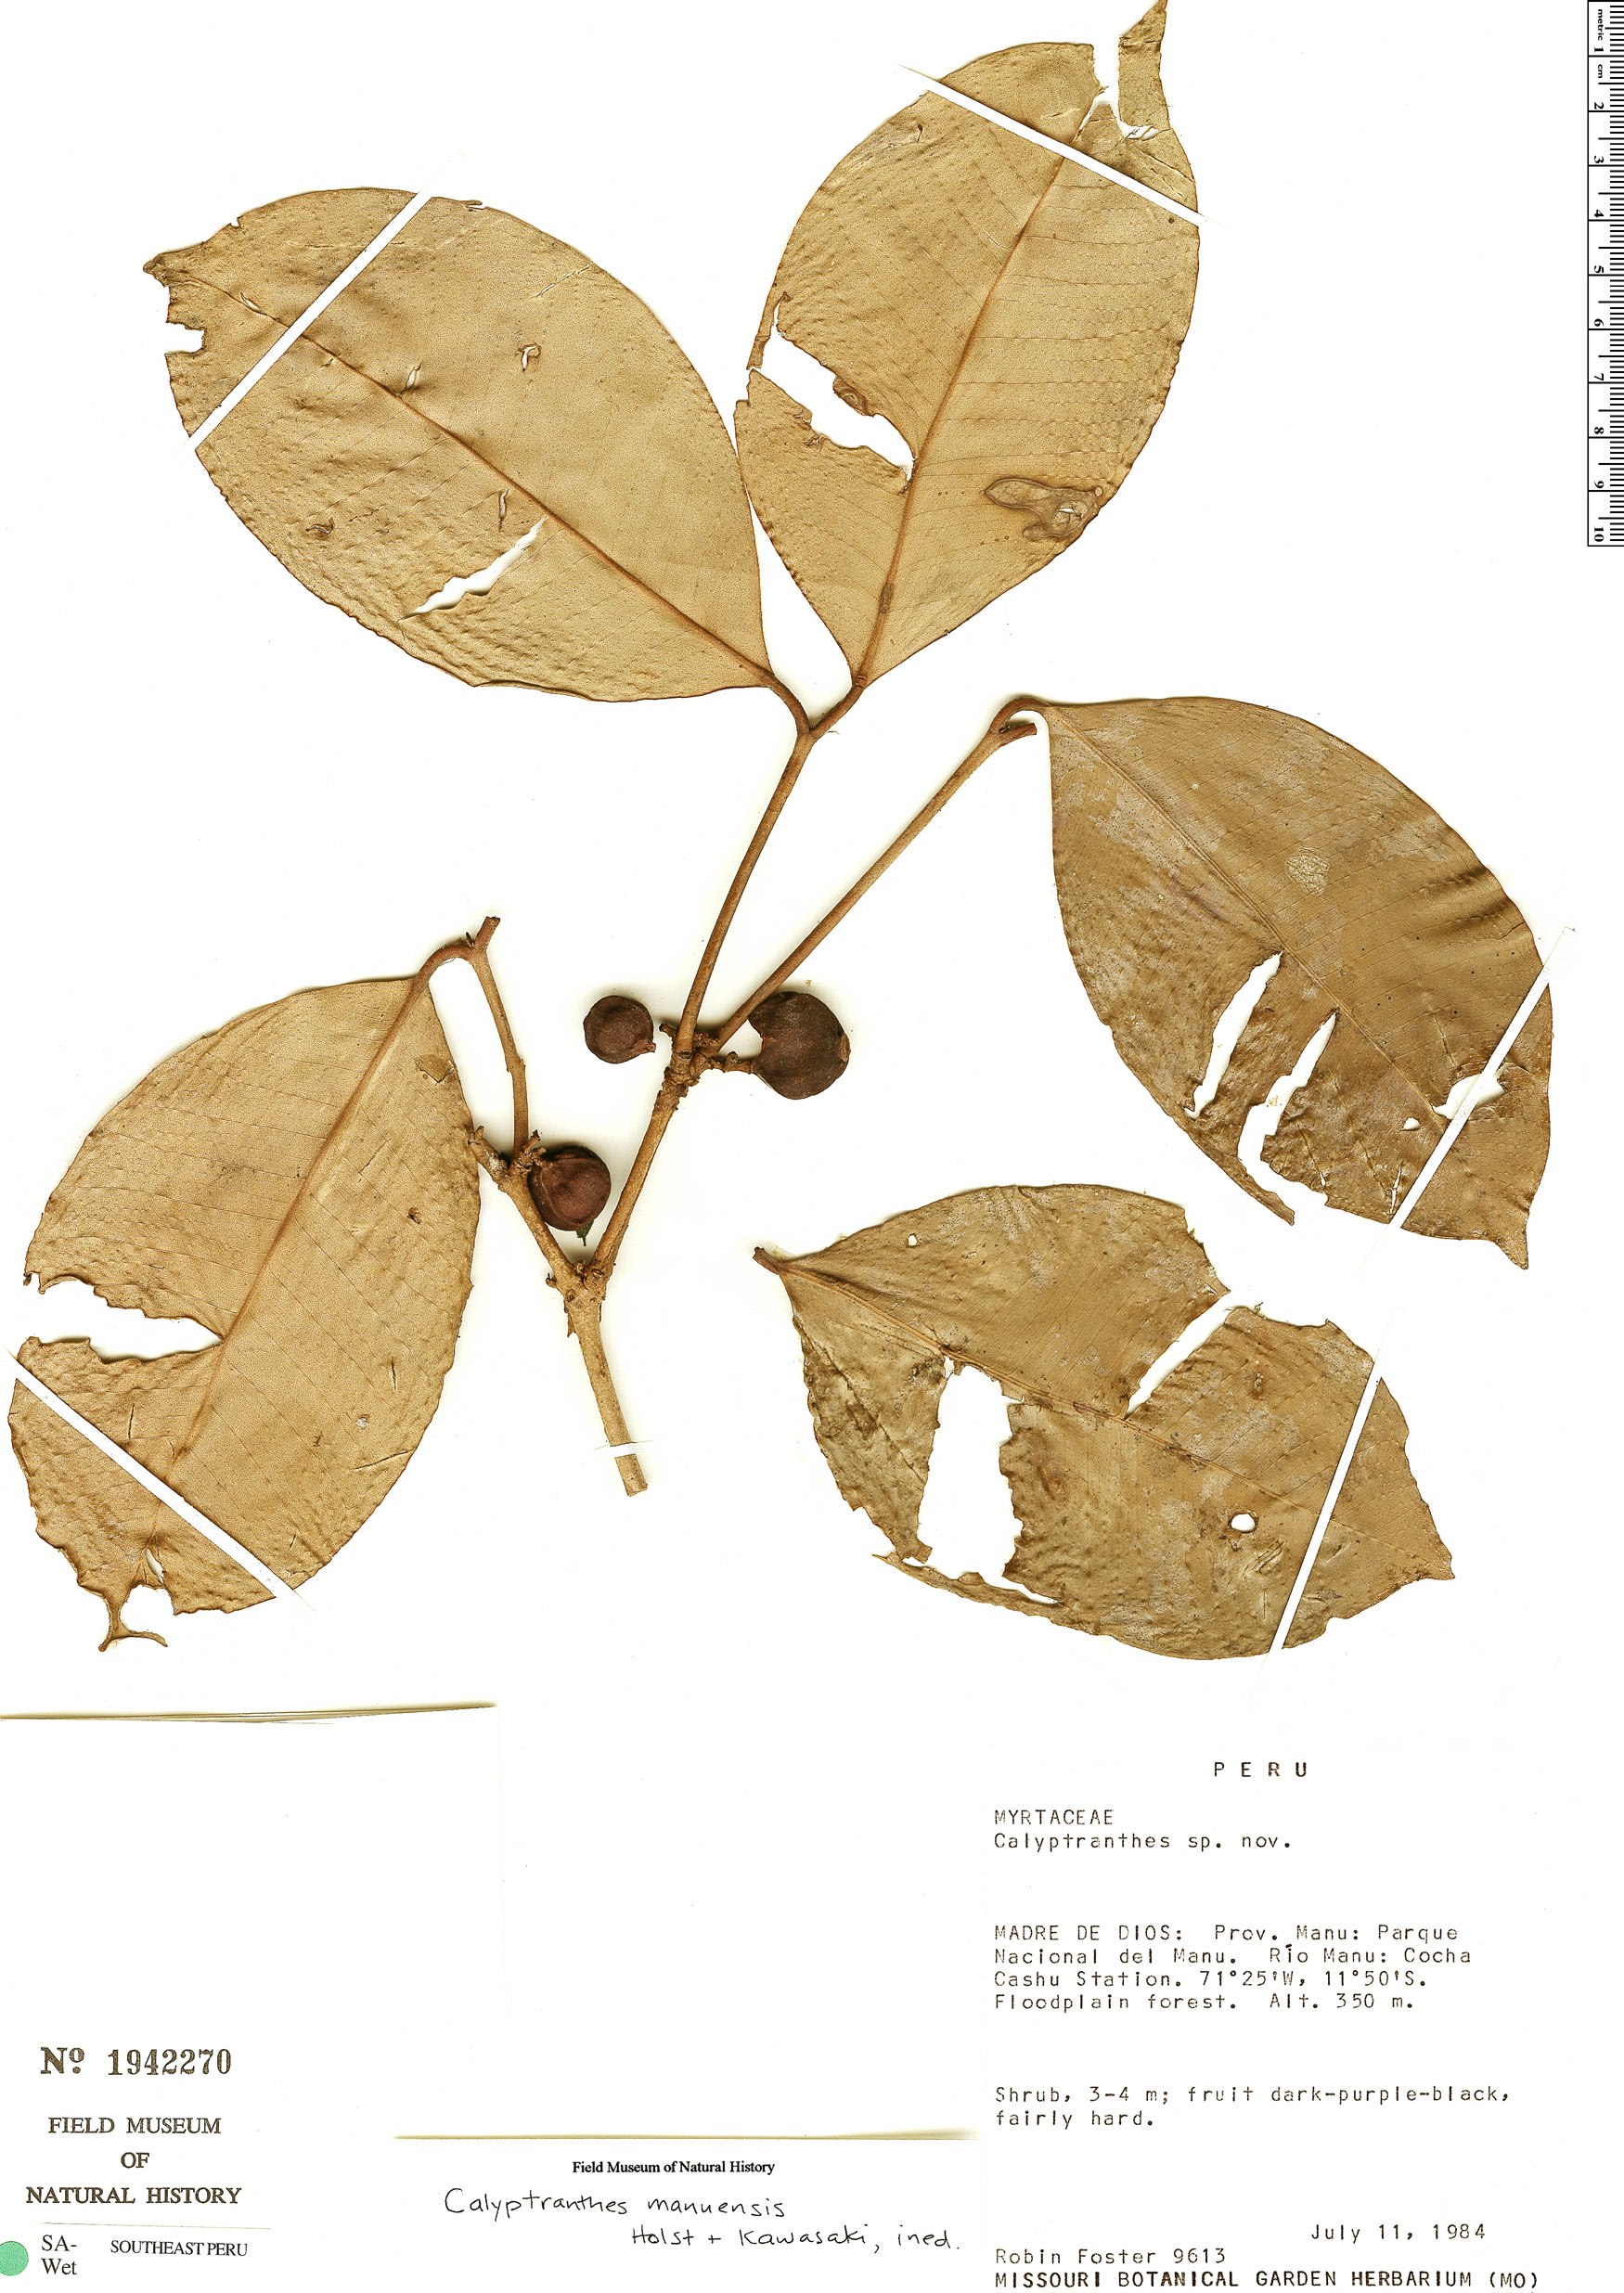 Specimen: Calyptranthes manuensis